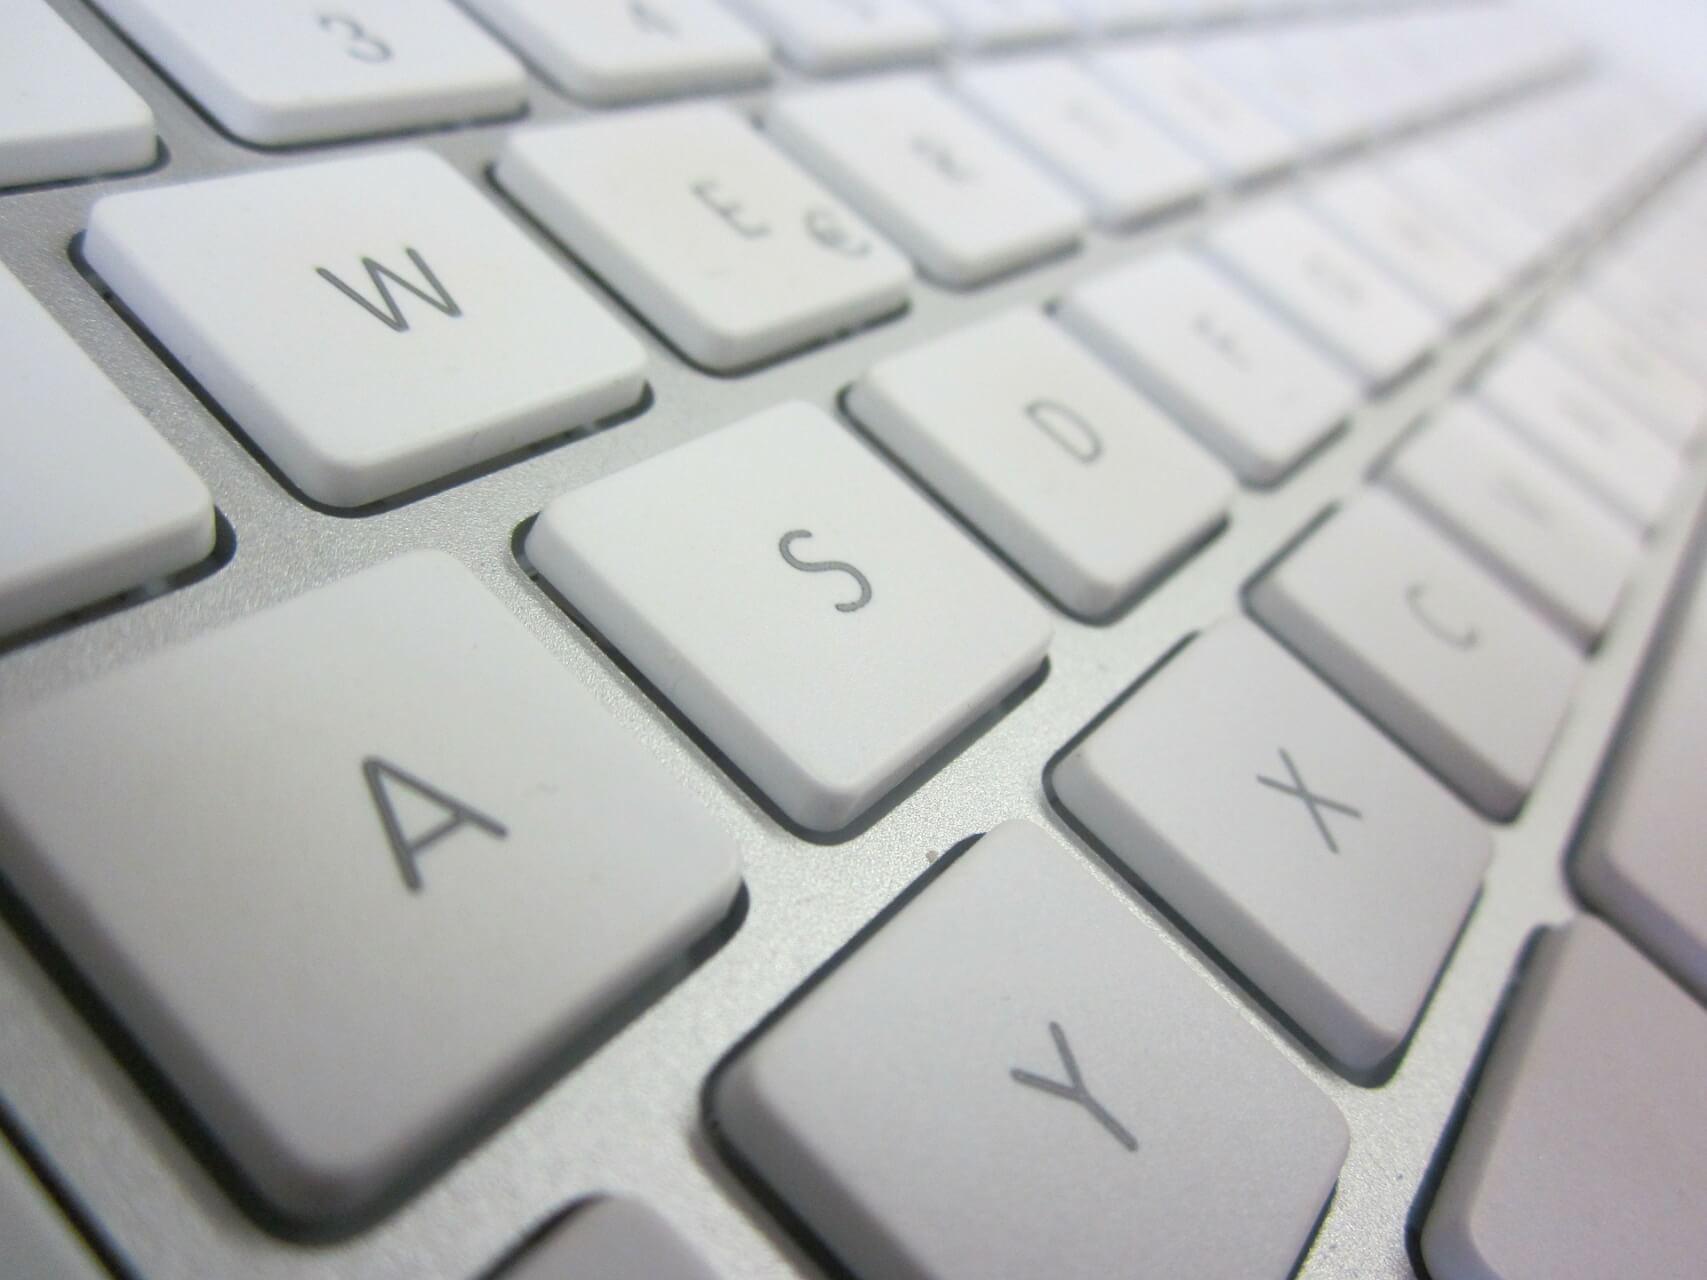 keyboard-57243_1920